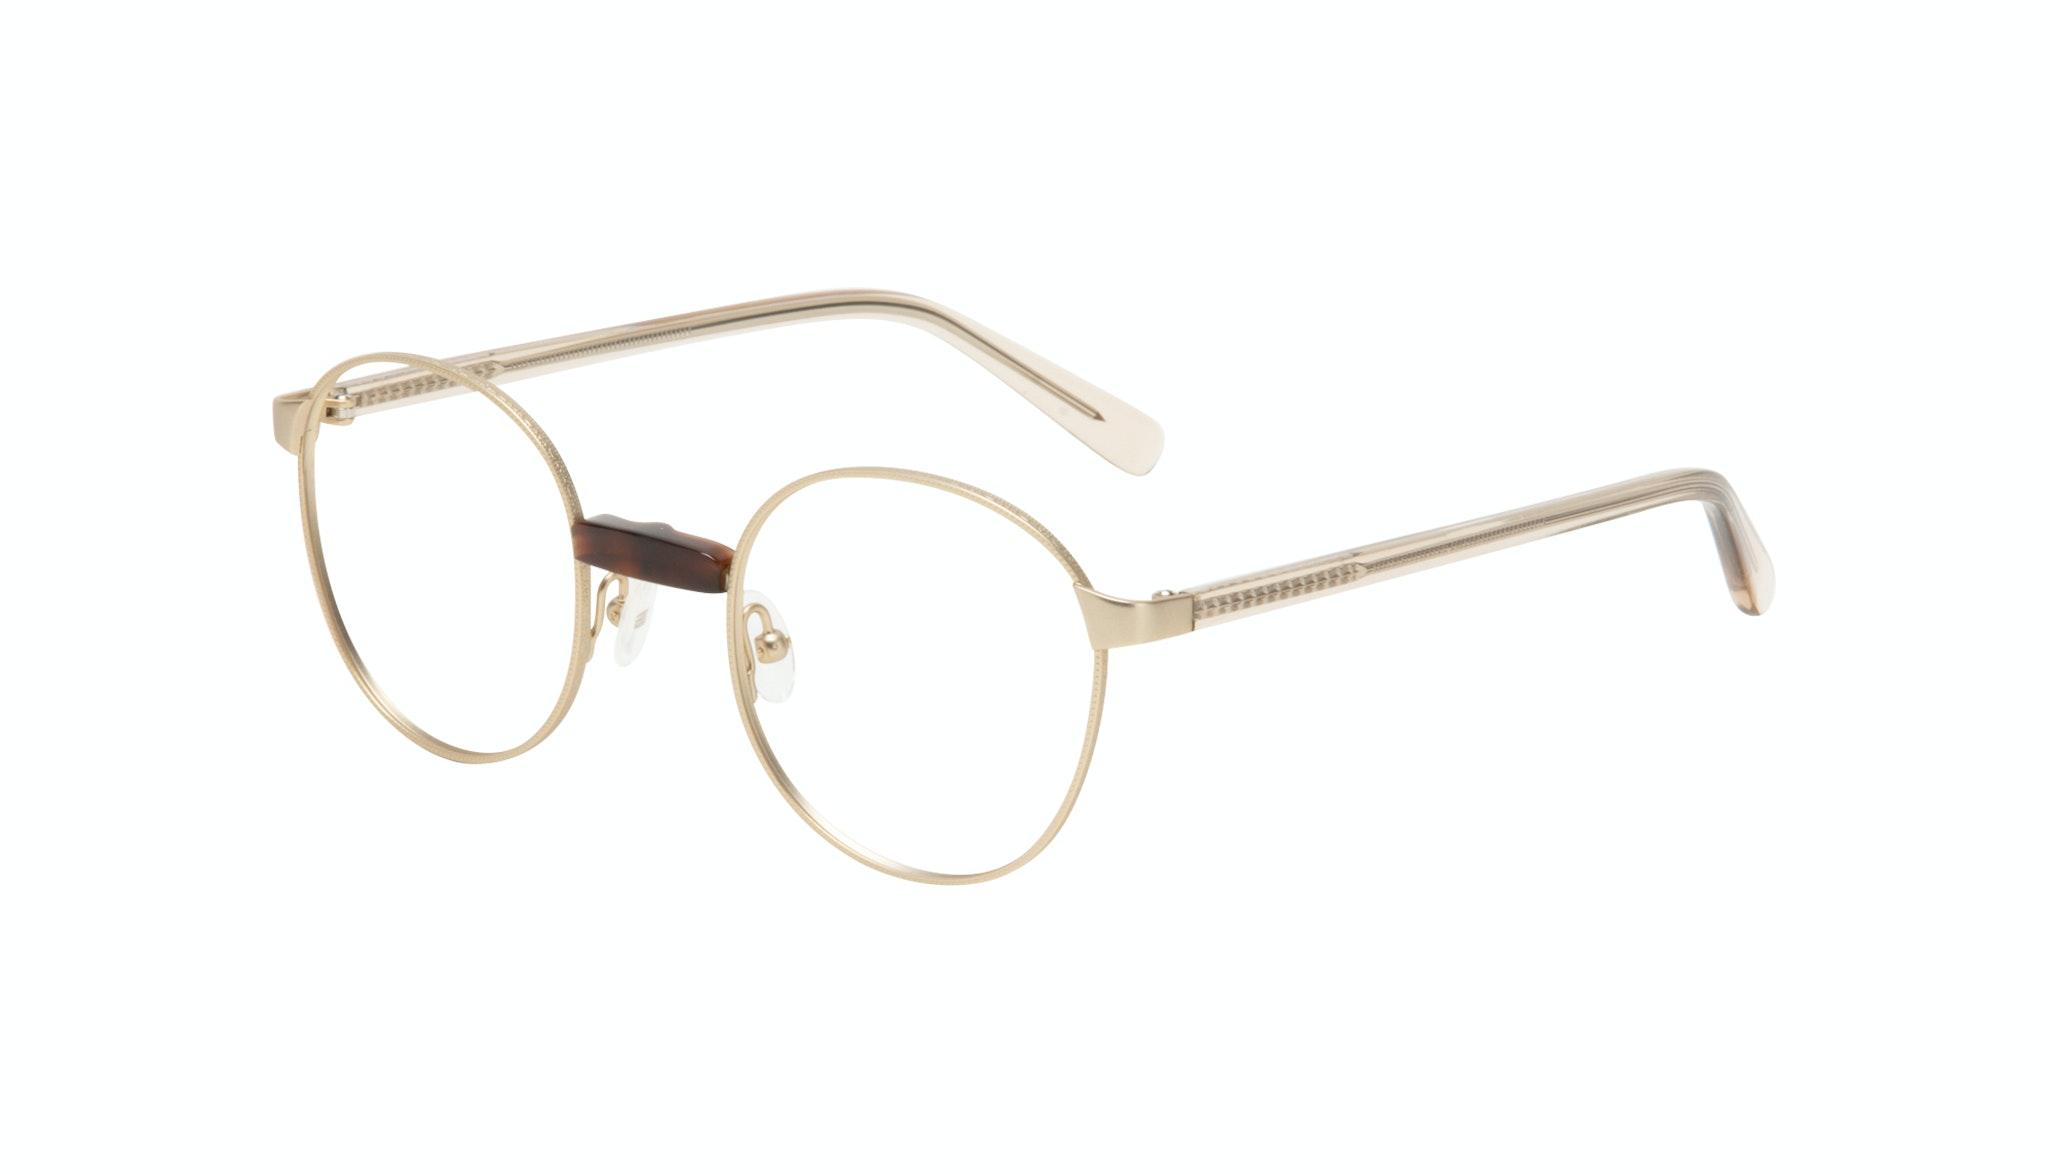 Affordable Fashion Glasses Round Eyeglasses Women Curious Gold Tilt